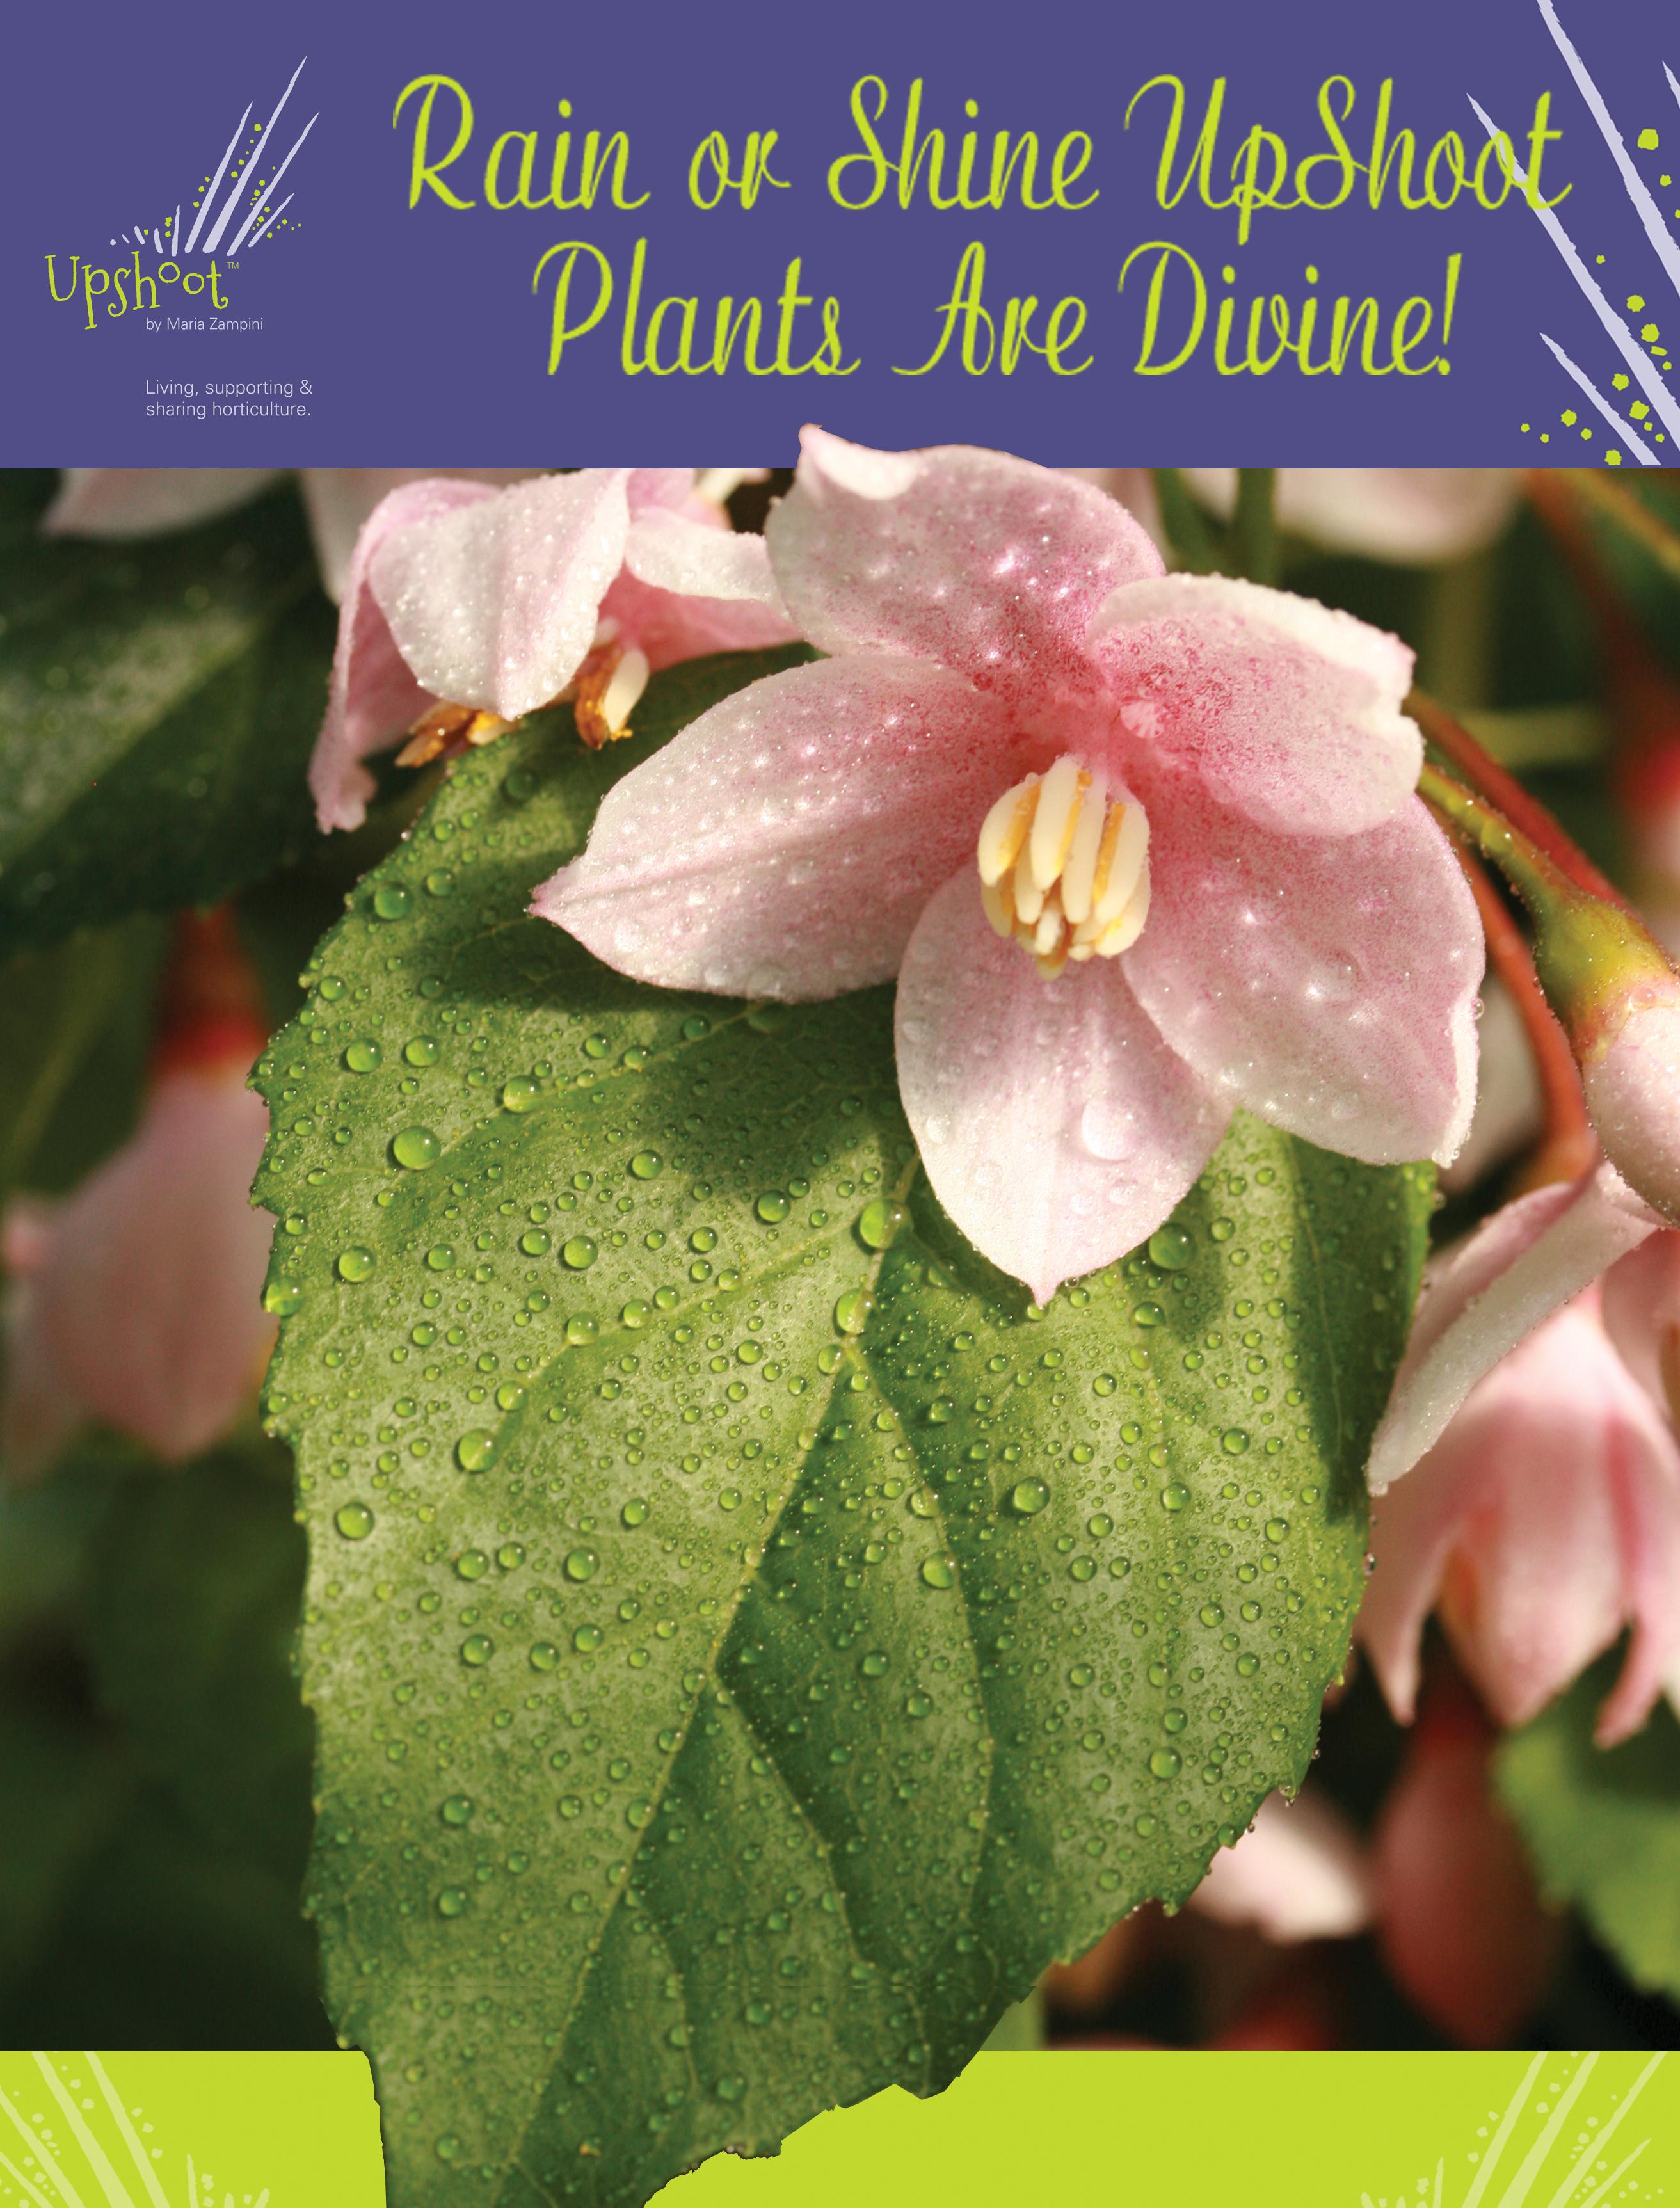 Rain or Shine UpShoot Plants Are Divine